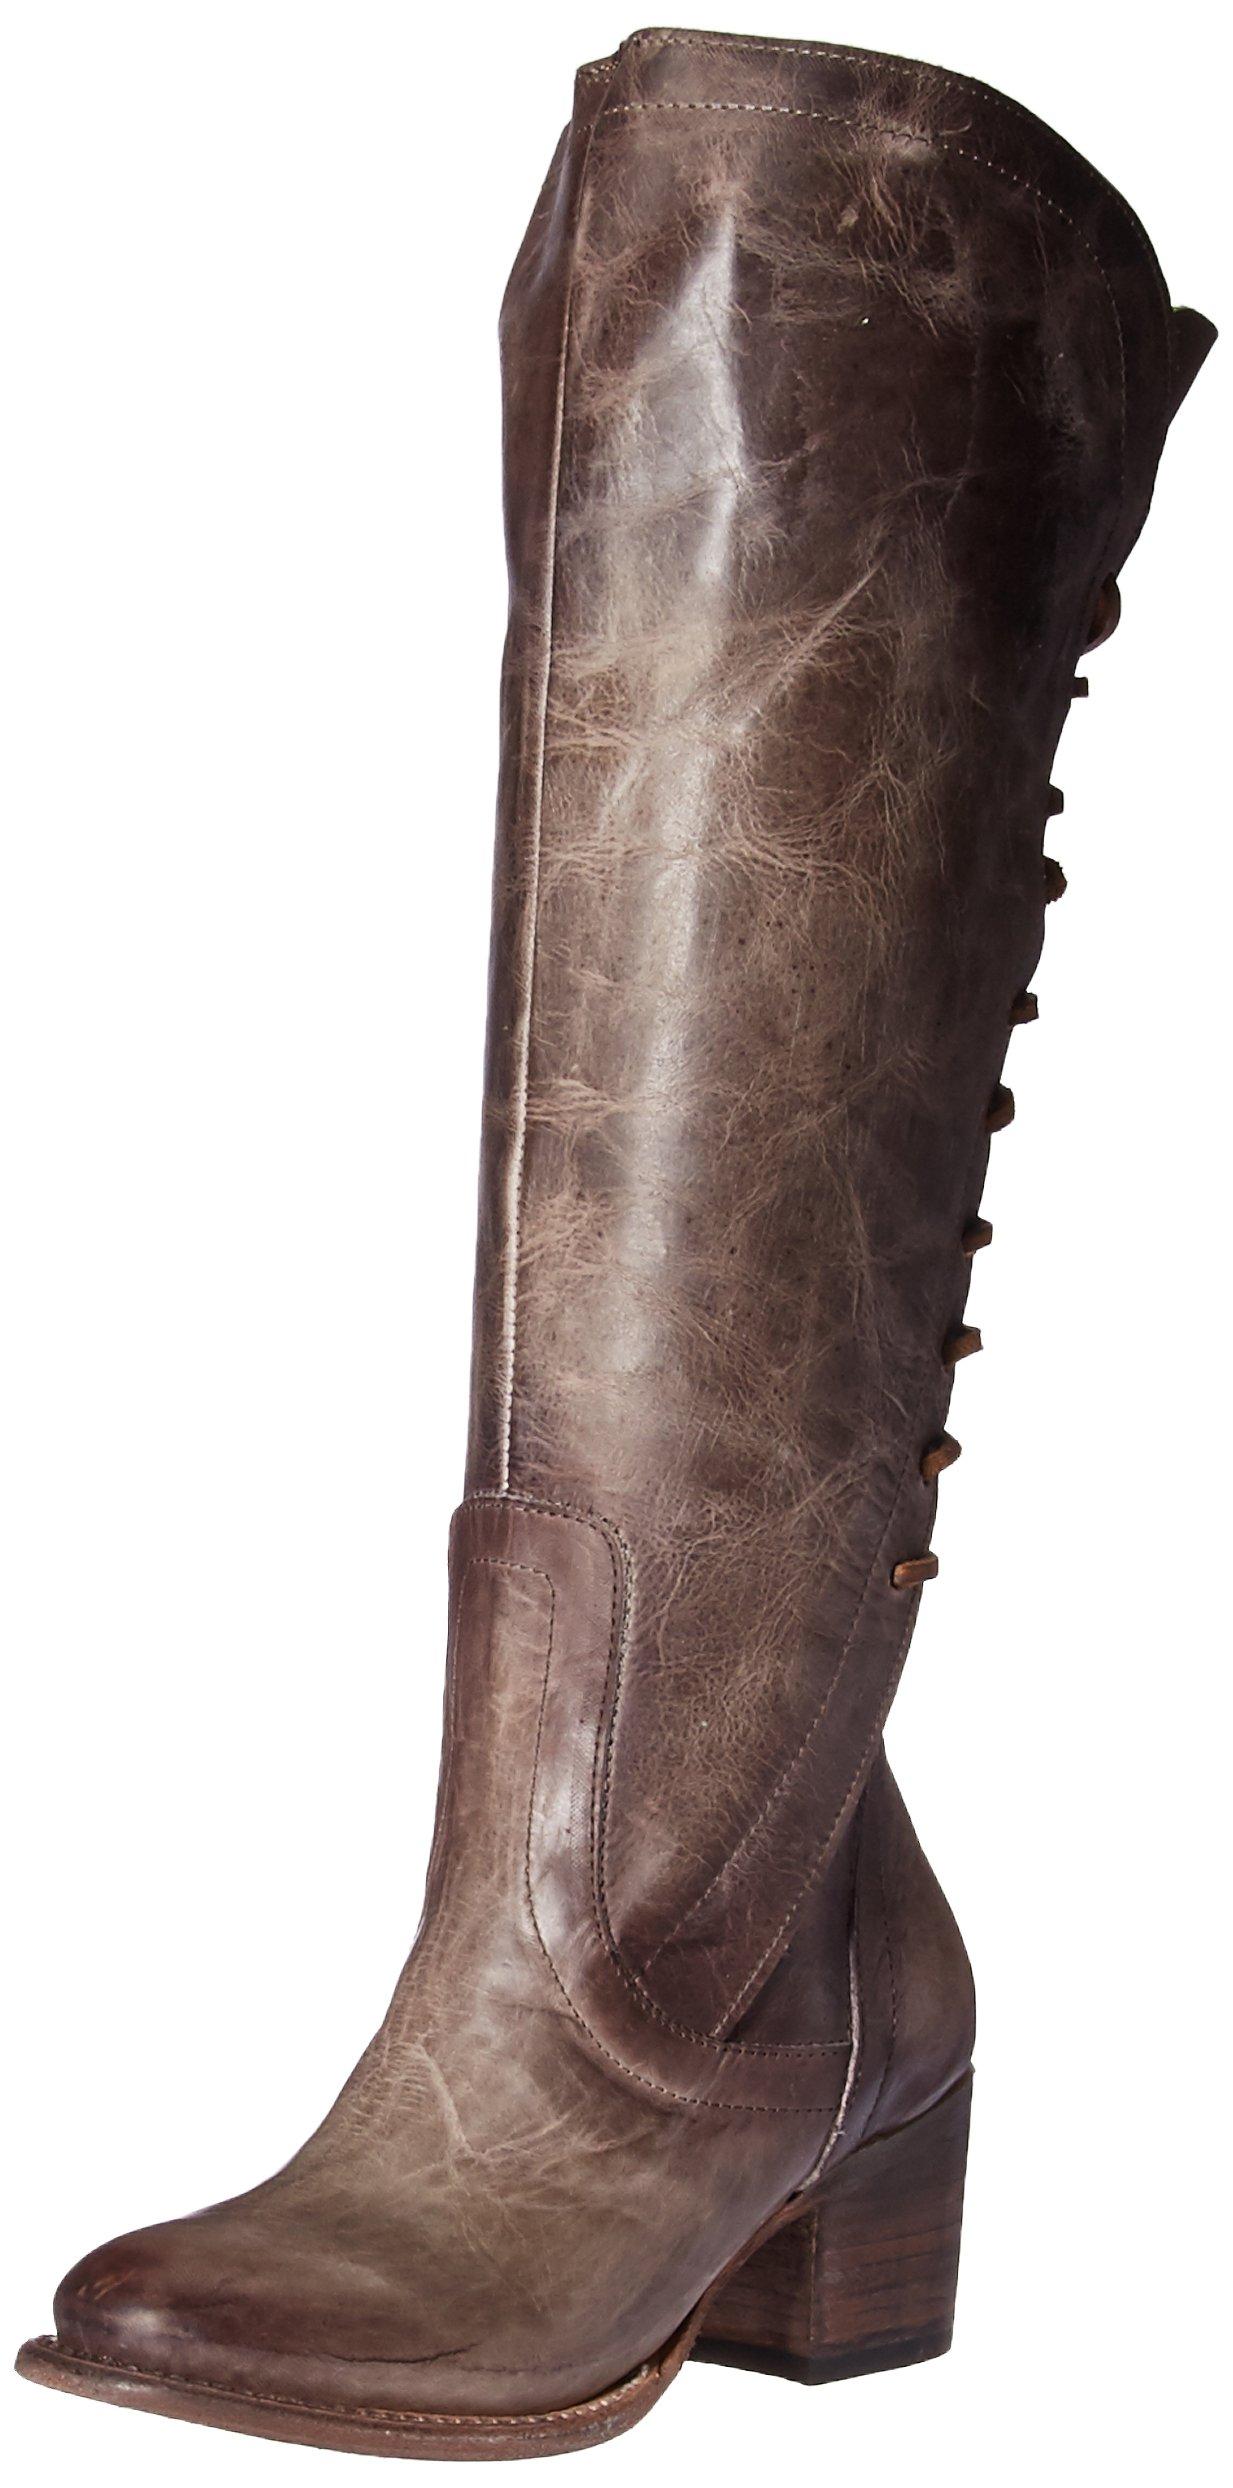 Freebird Women's FB-Cosmo Knee High Boot, Stone, 8 M US